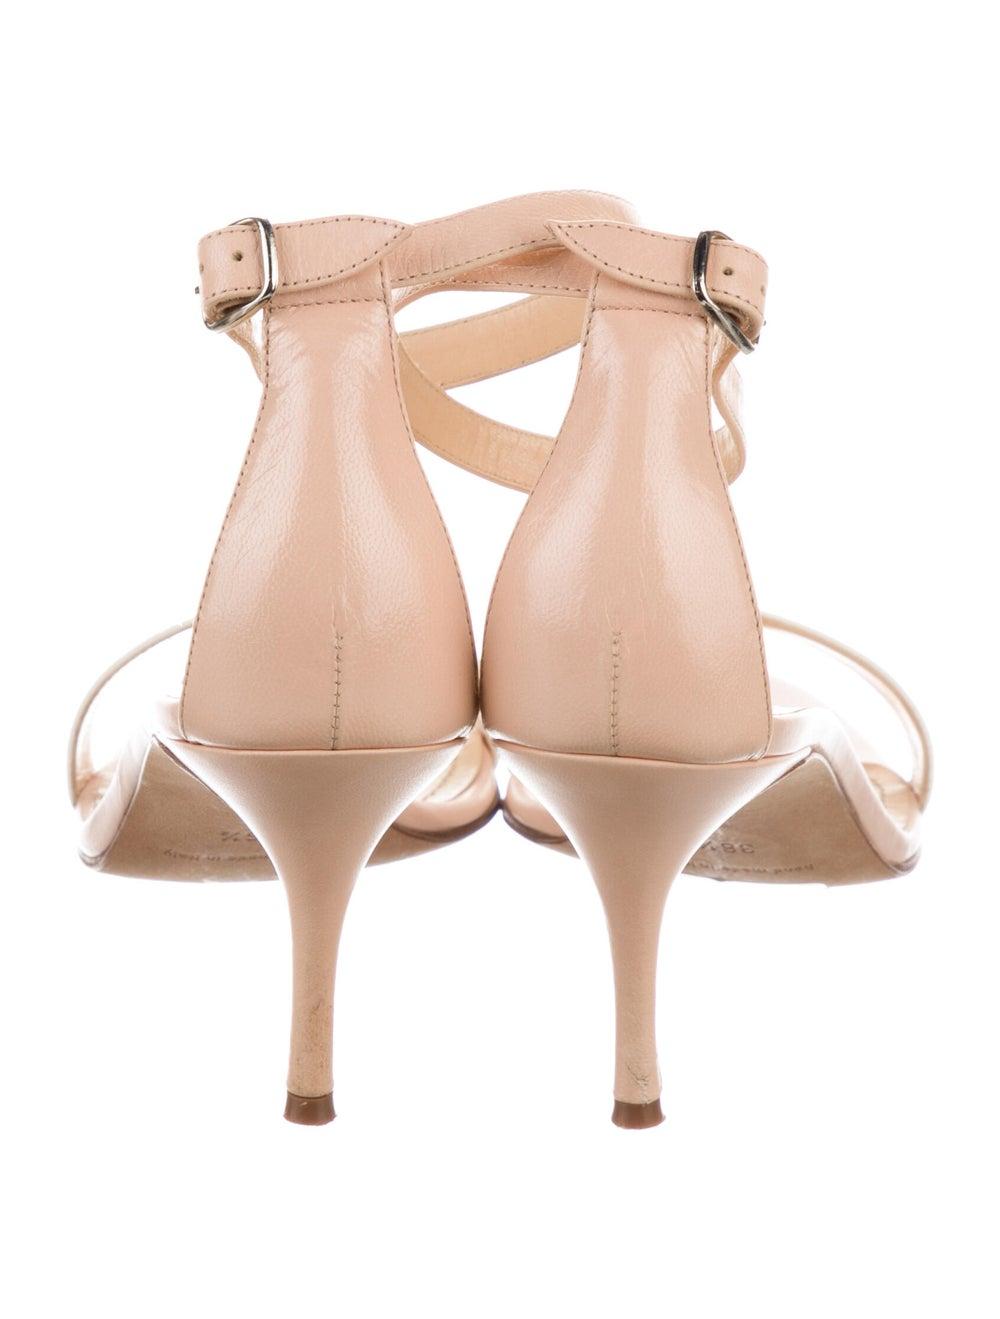 Manolo Blahnik Leather Sandals - image 4